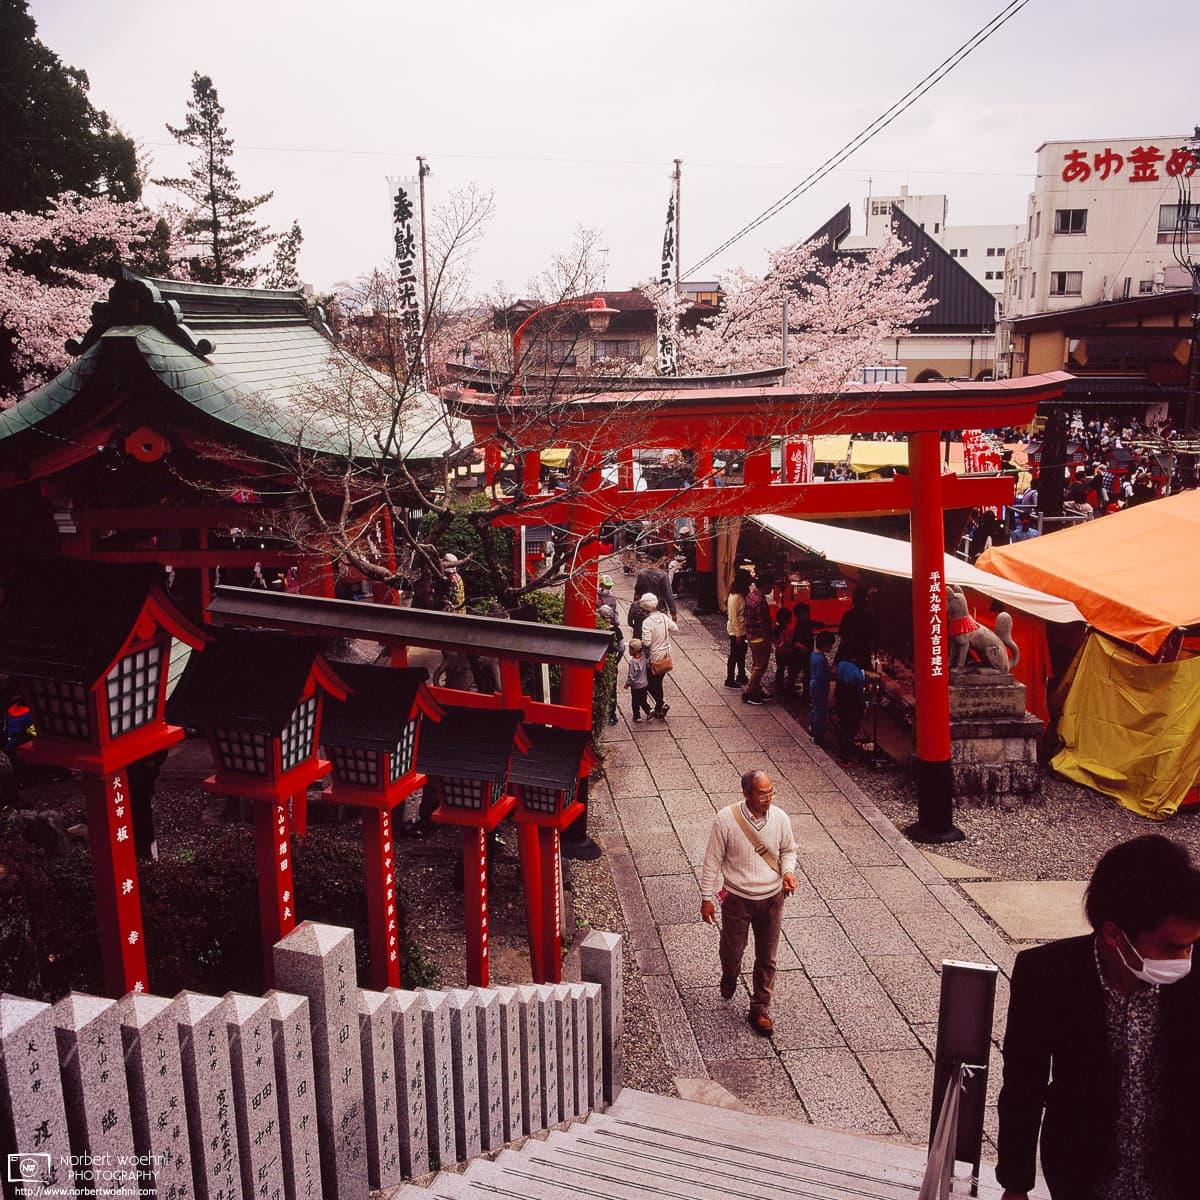 Cherry Blossom Festival Day, Sanko Inari Shrine, Inuyama, Japan Photo